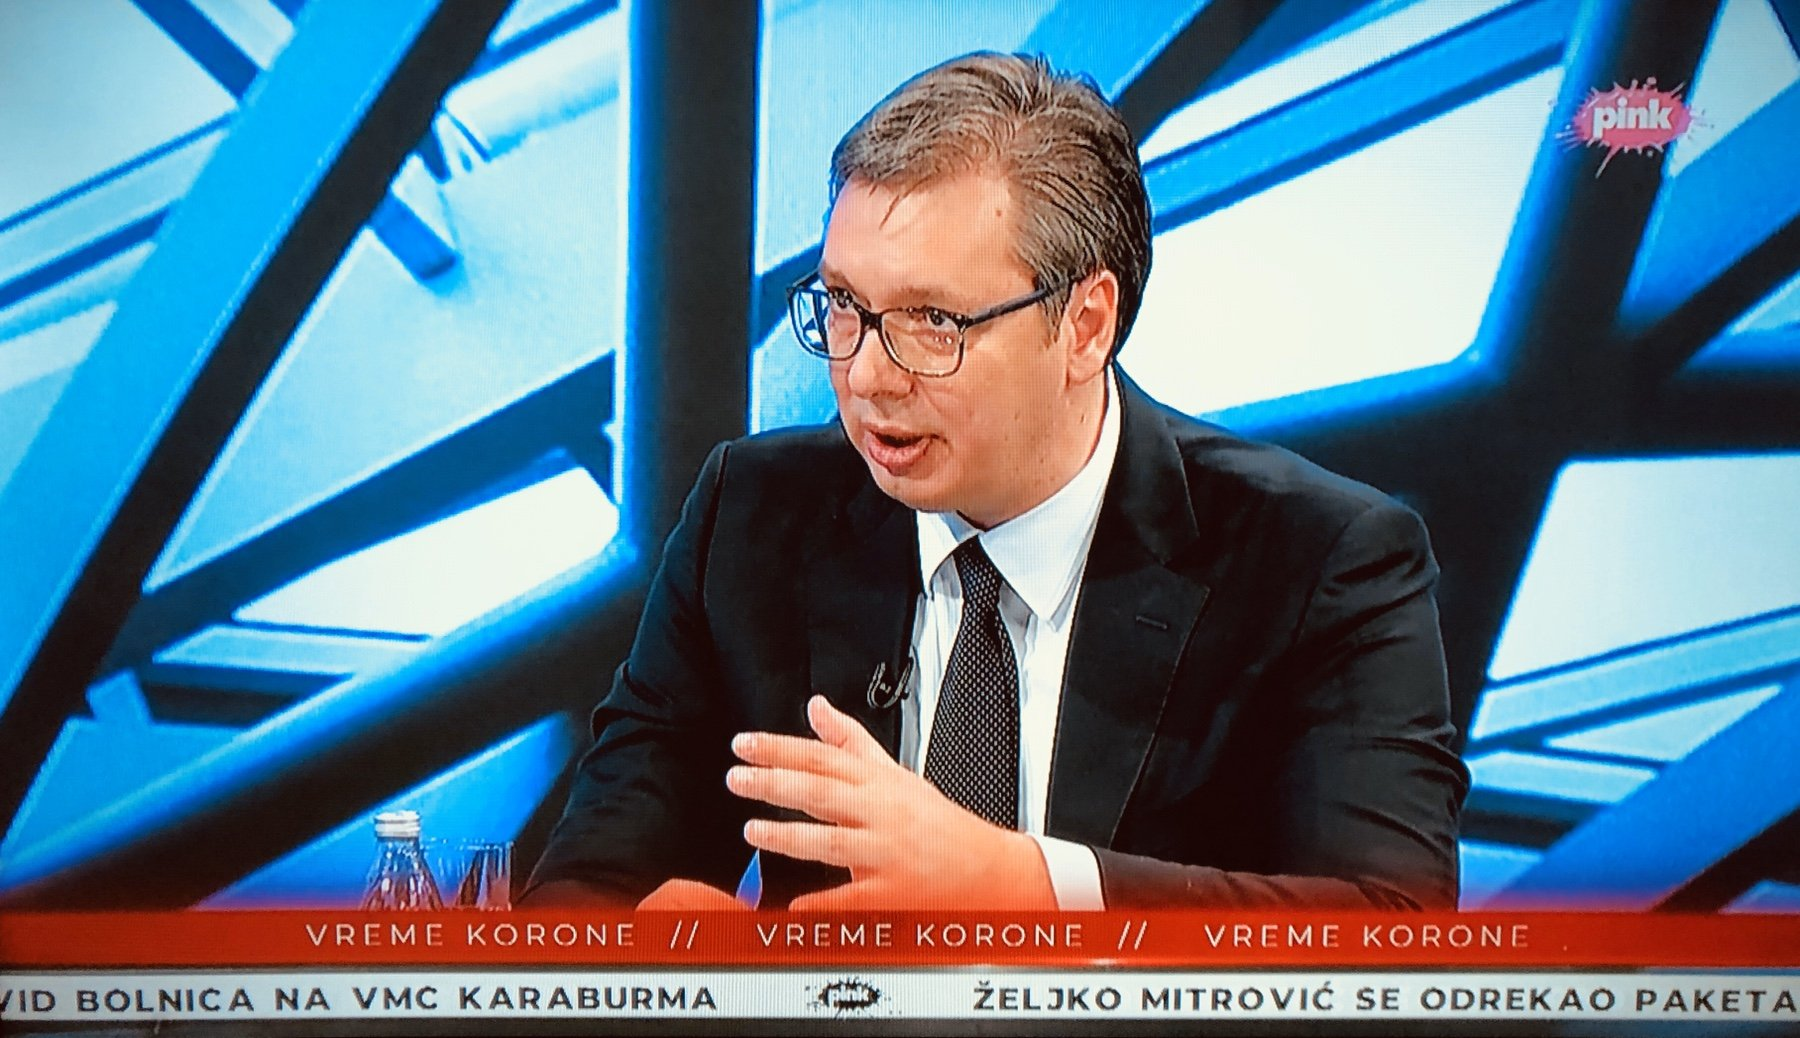 Predsednik Vučić na TV ,,Pink'', foto: TV ,,Pink''